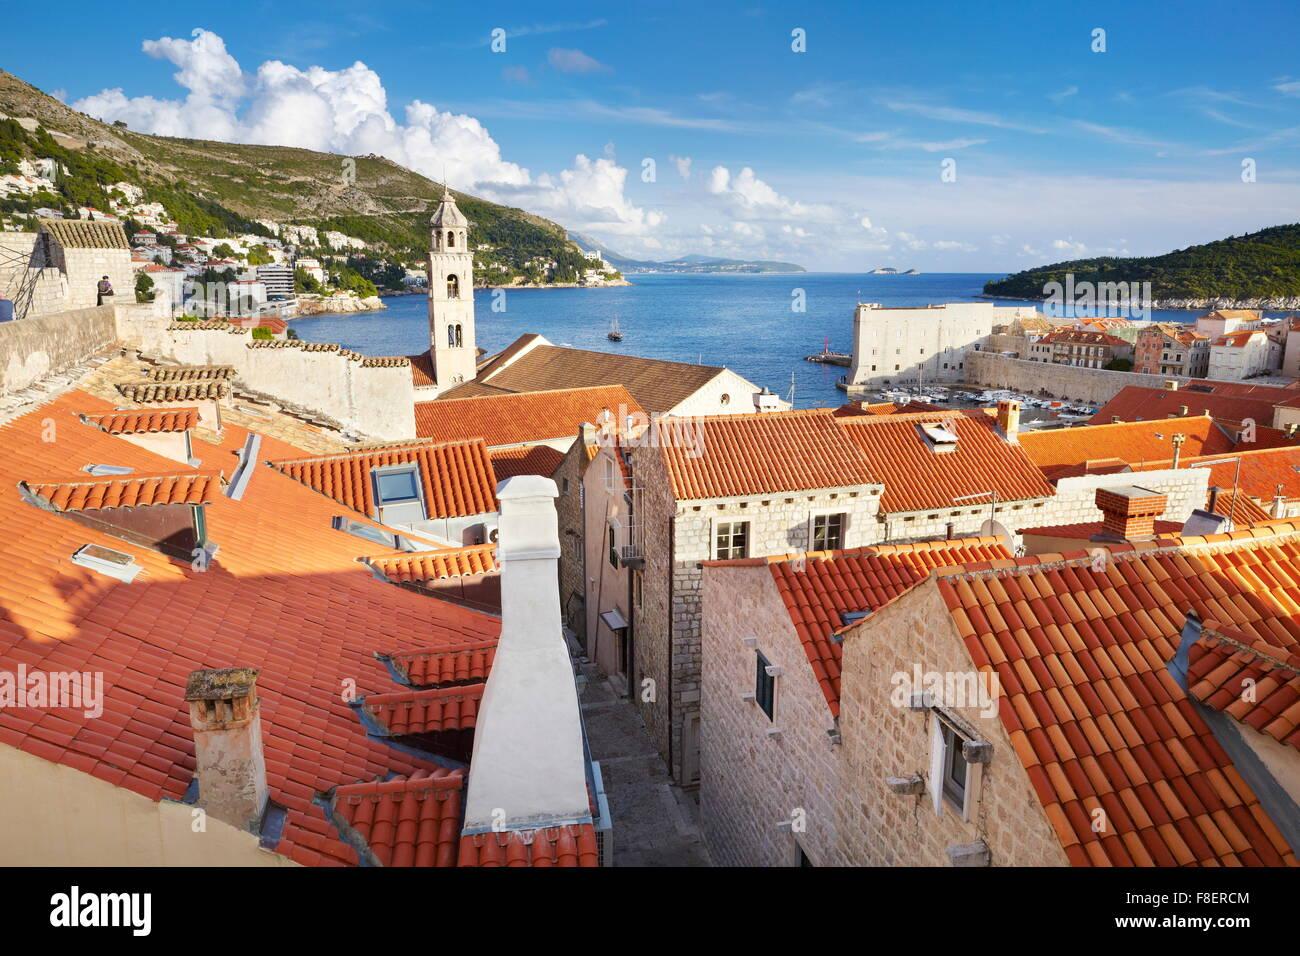 Dubrovnik Old Town, Croatia - Stock Image